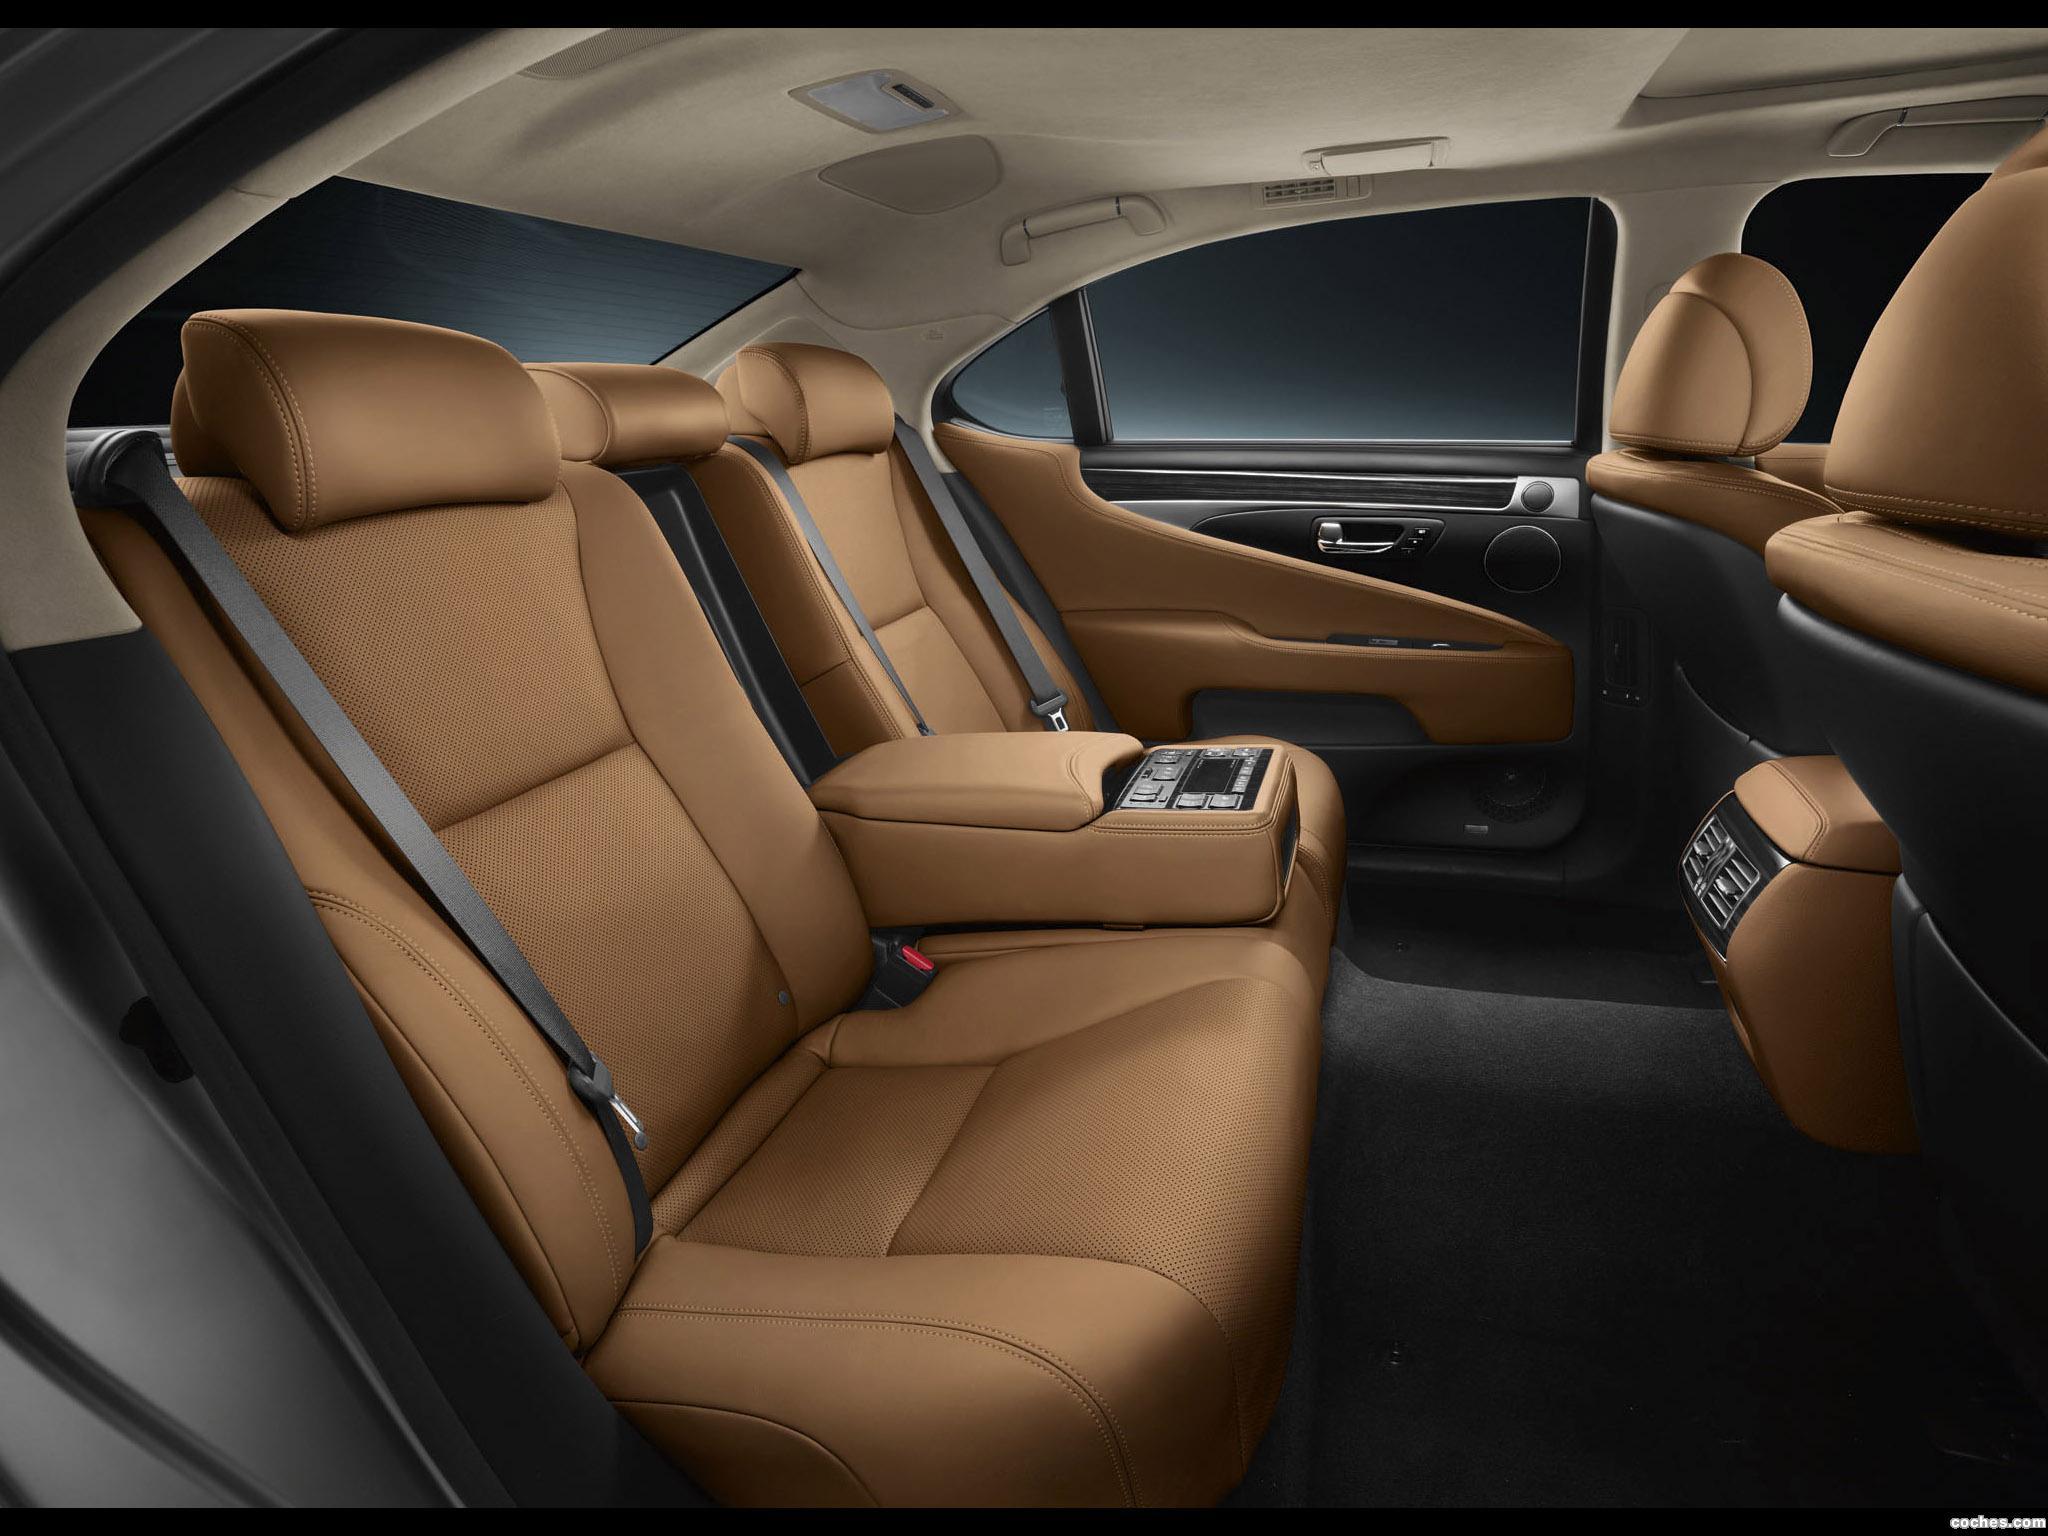 Foto 5 de Lexus LS 600h Europa 2013